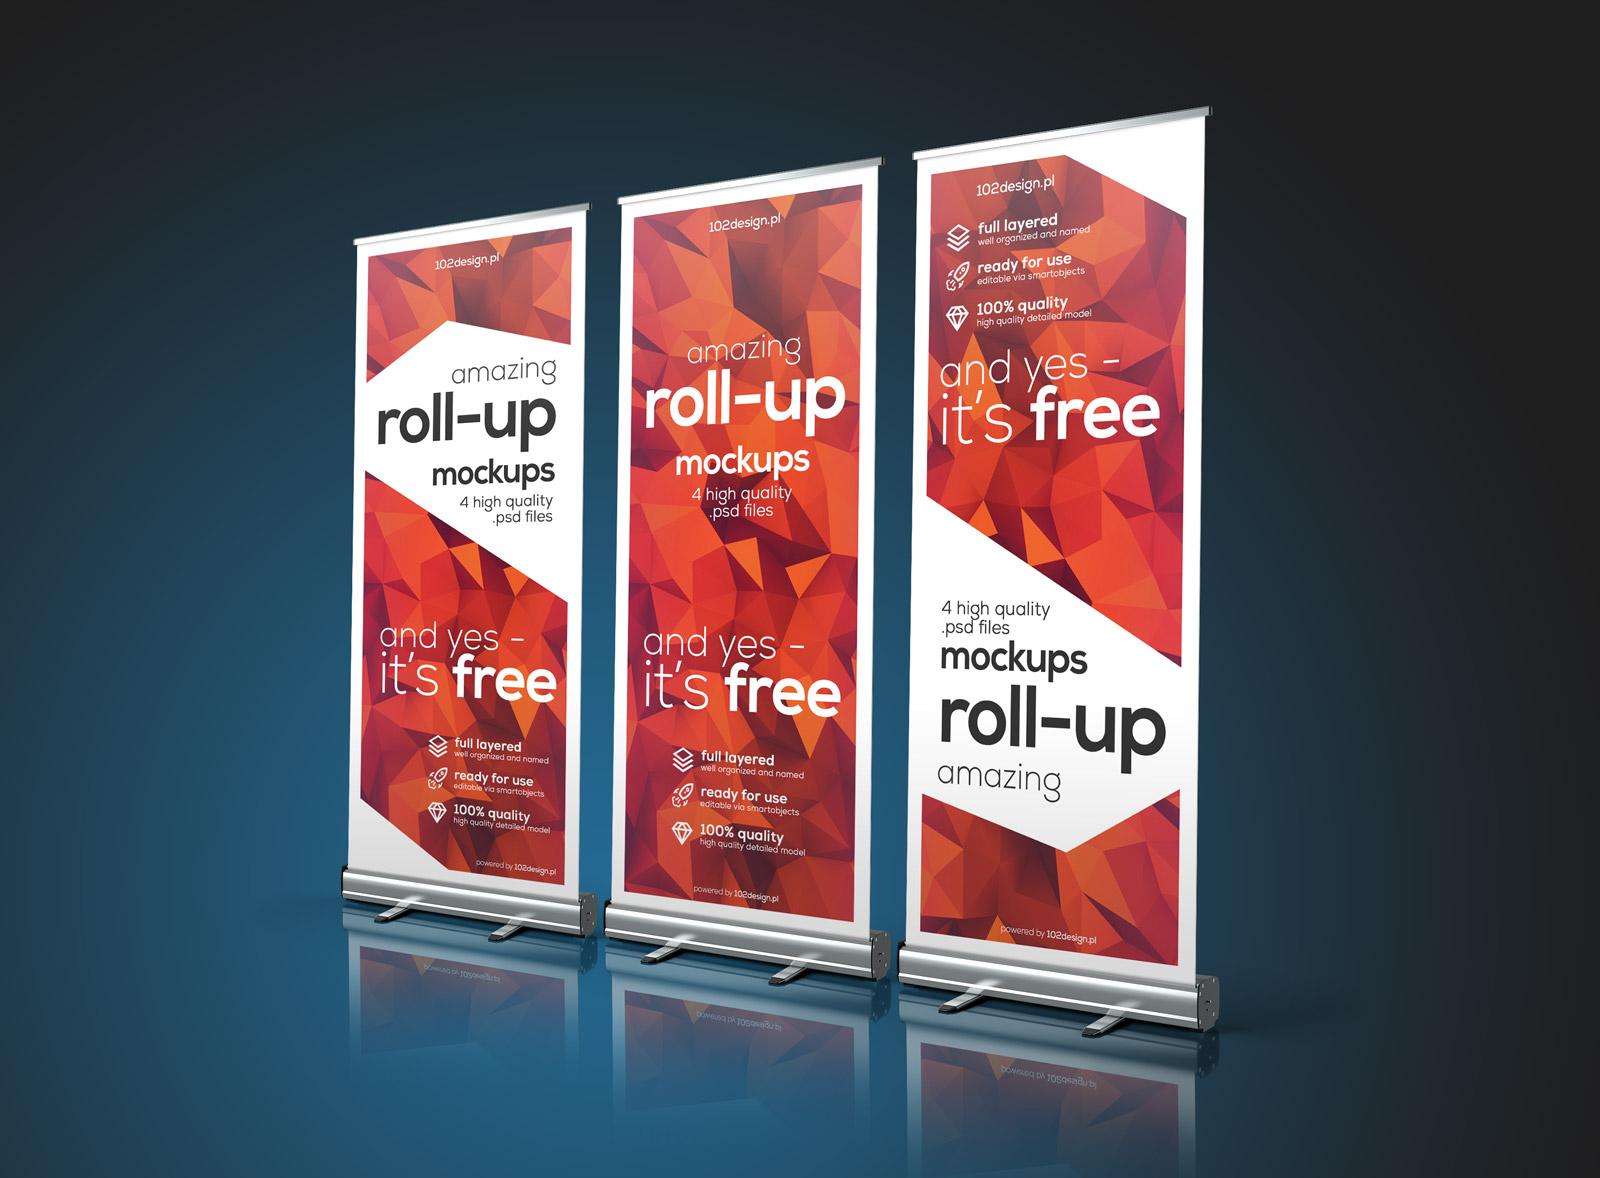 Free-Premuim-Pull-up-Banner-Stand-Mockup-PSD-file